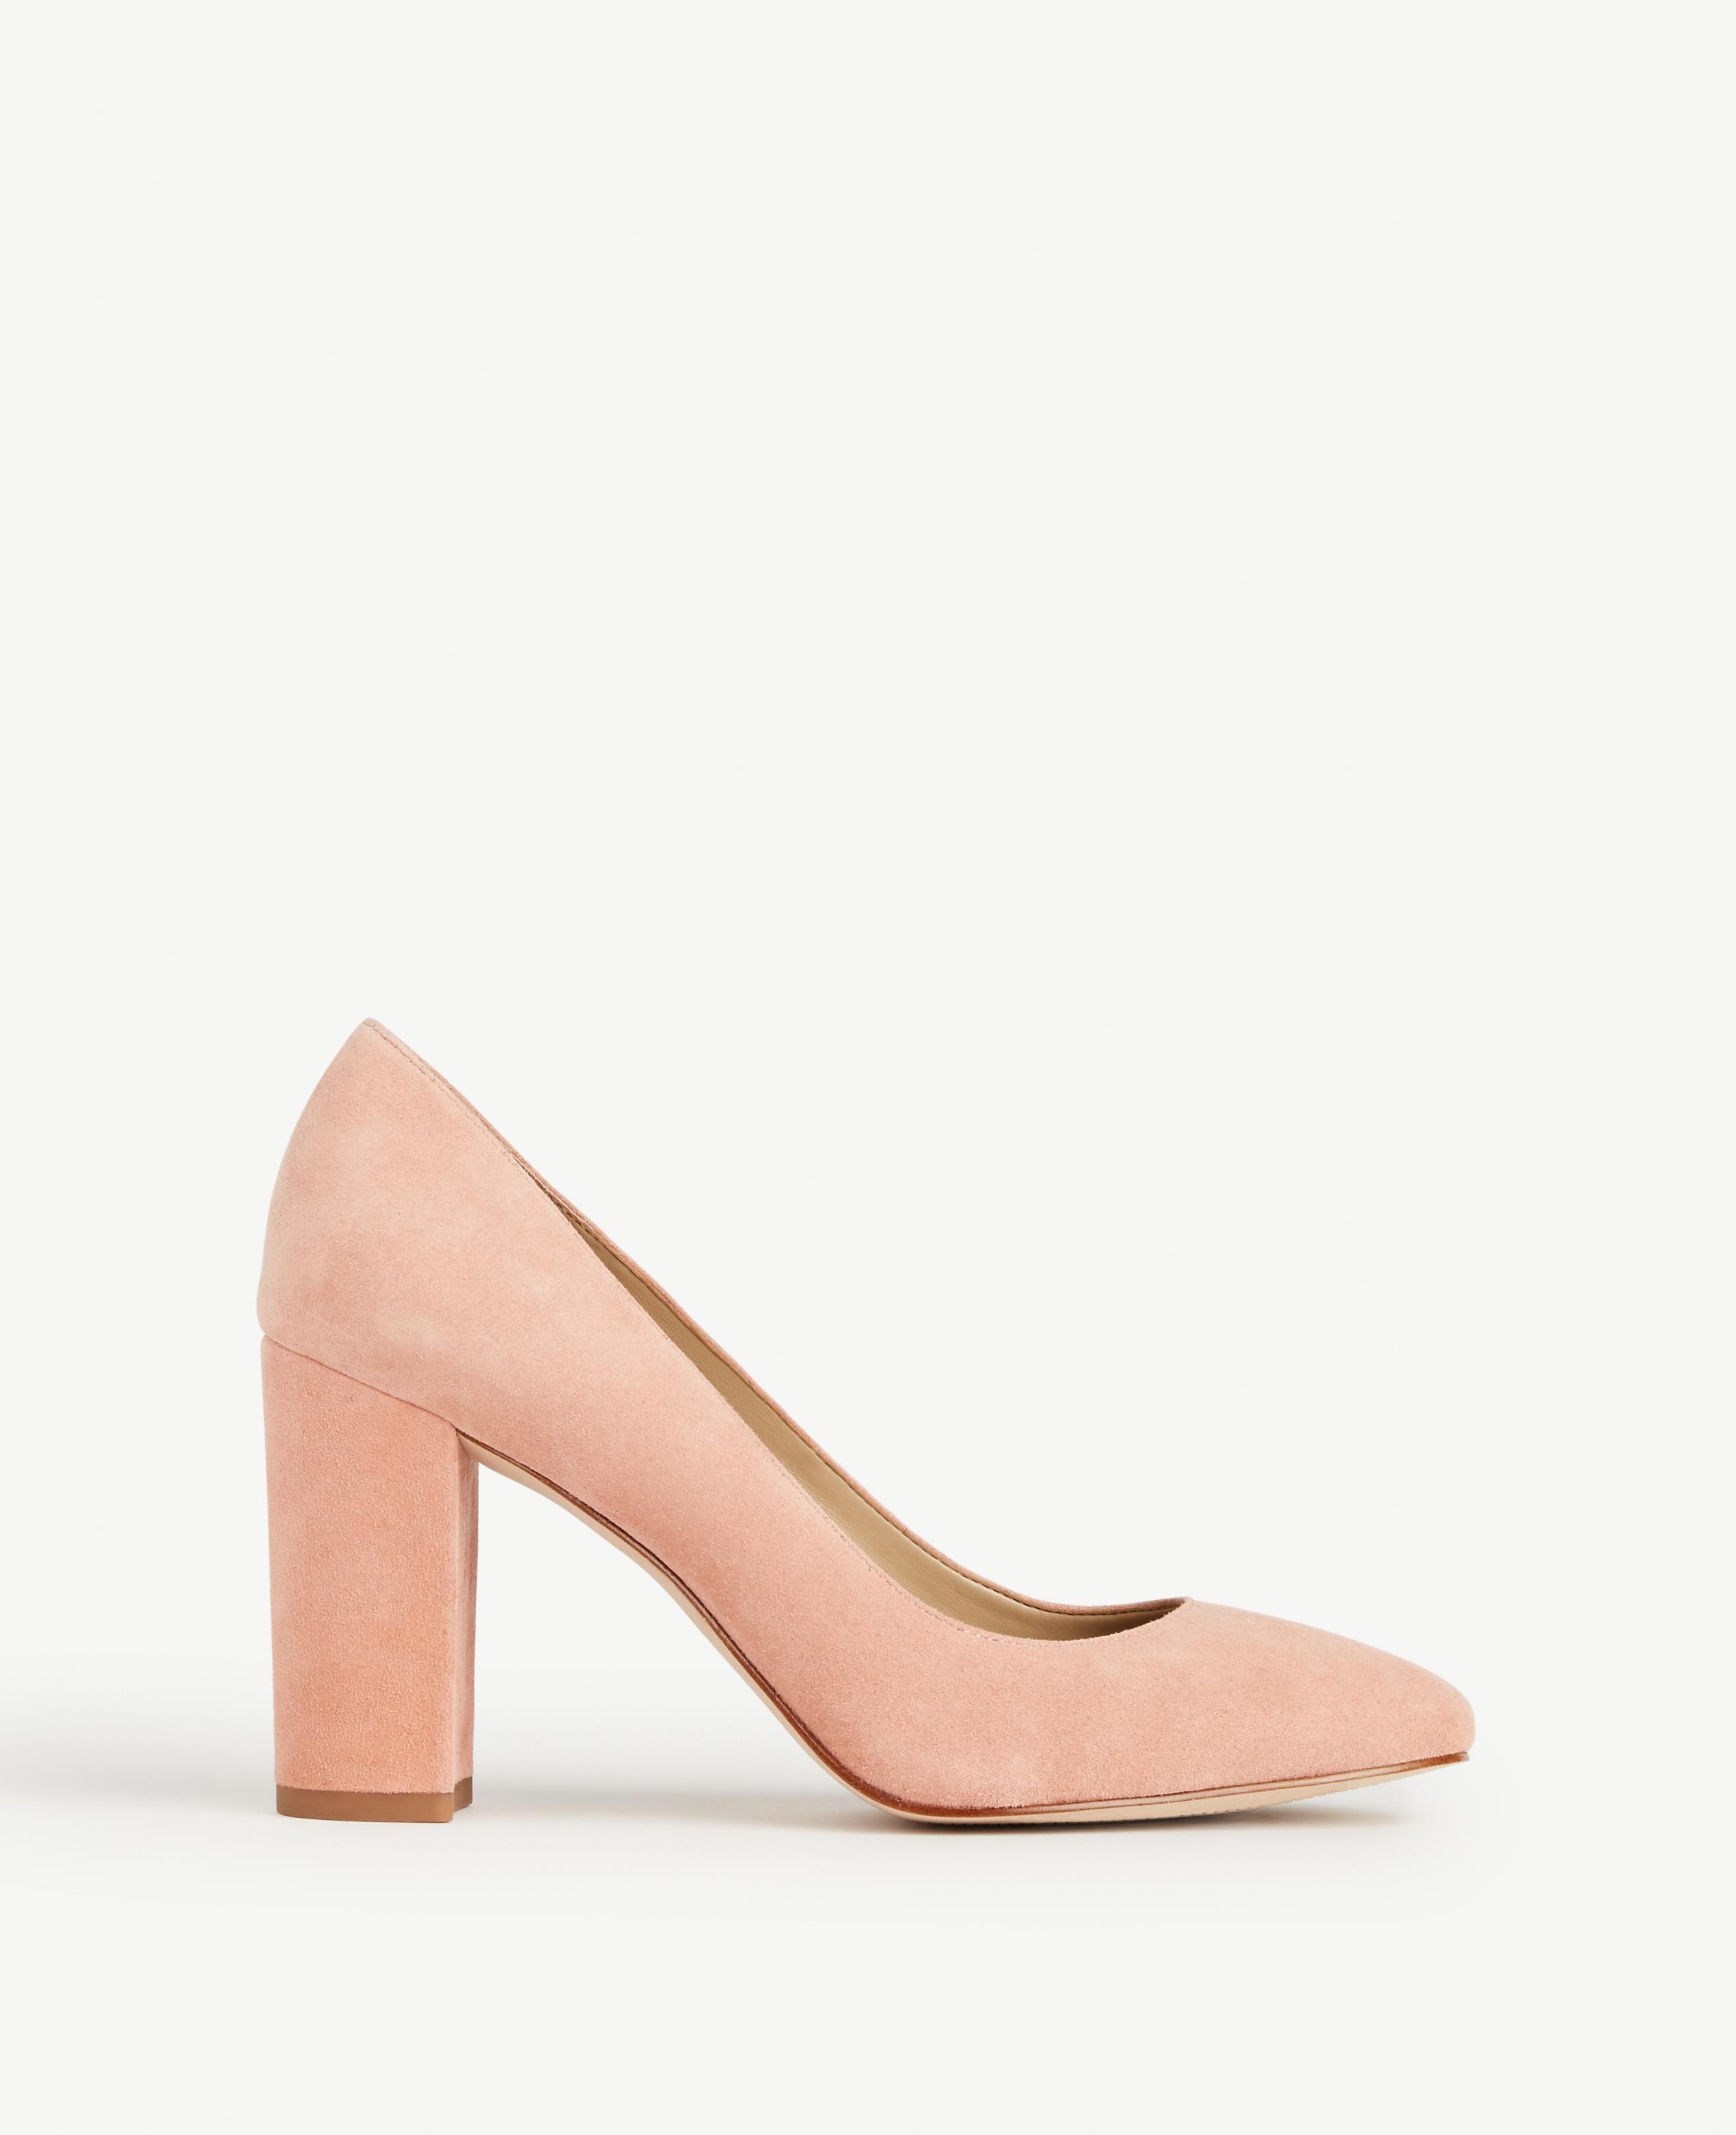 b4abbfc08cb Lyst - Ann Taylor Emeline Suede Block Heel Pumps in Pink